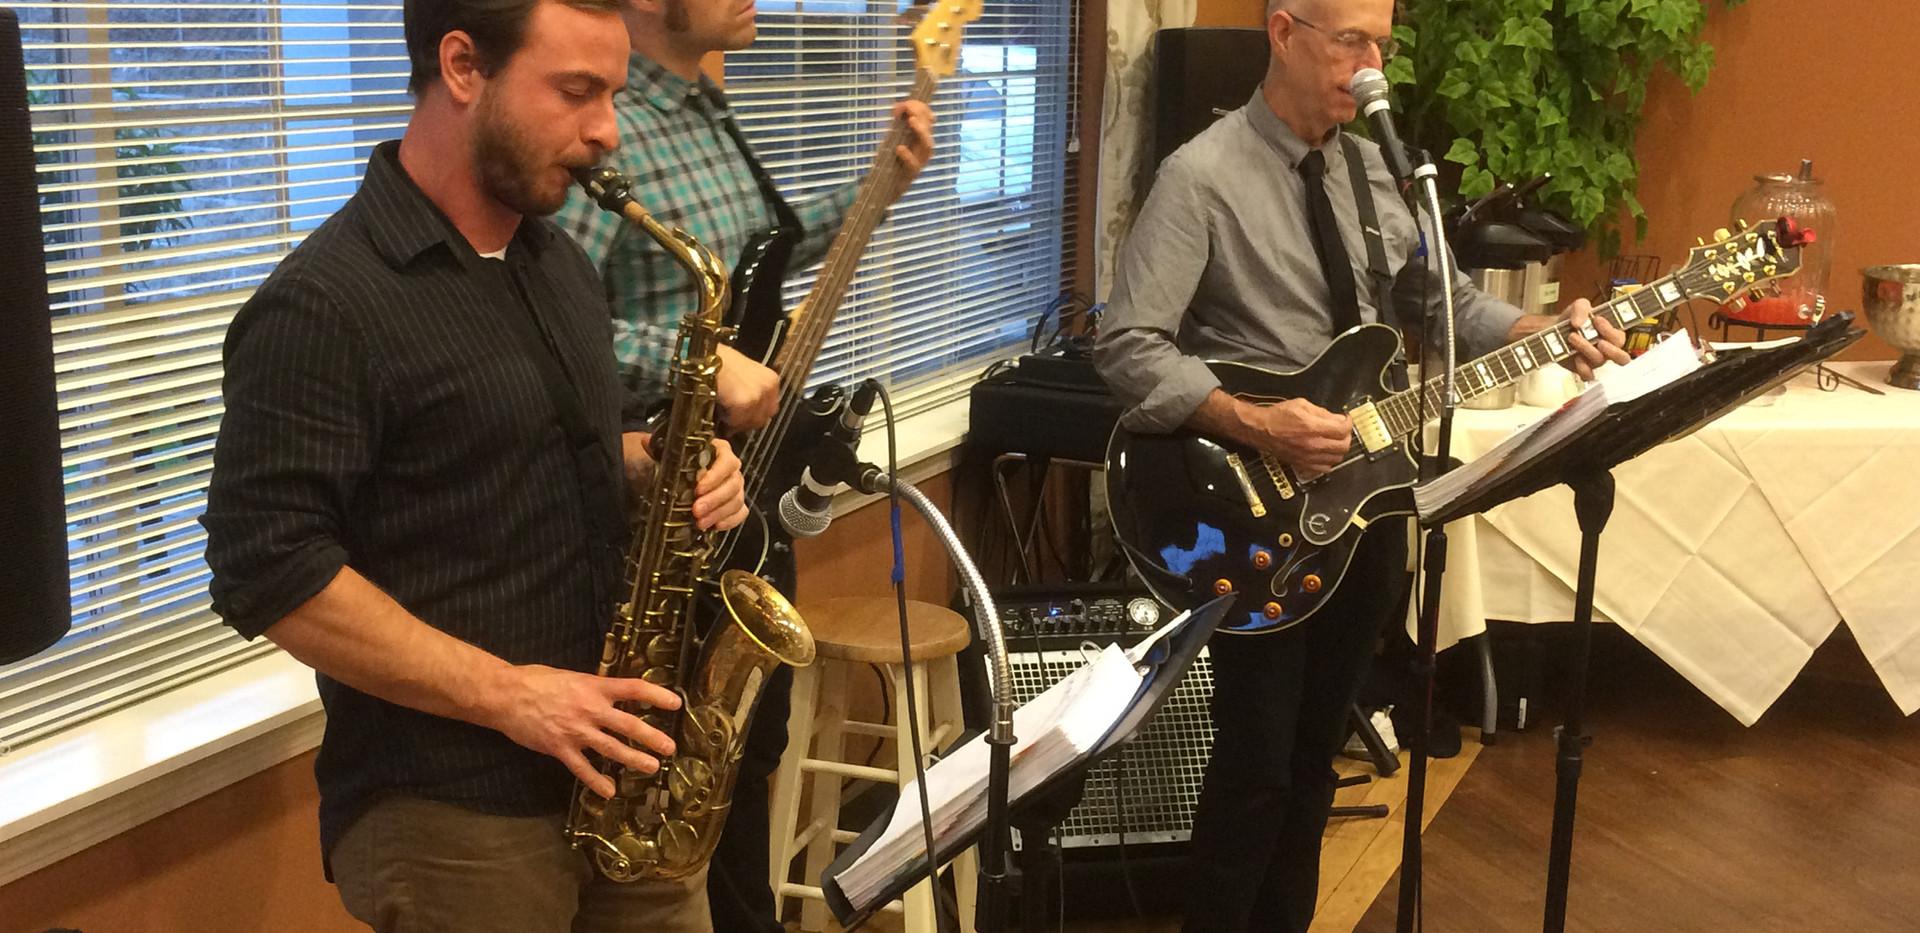 Pete Redmond's Crazy feet plays at local Community Center